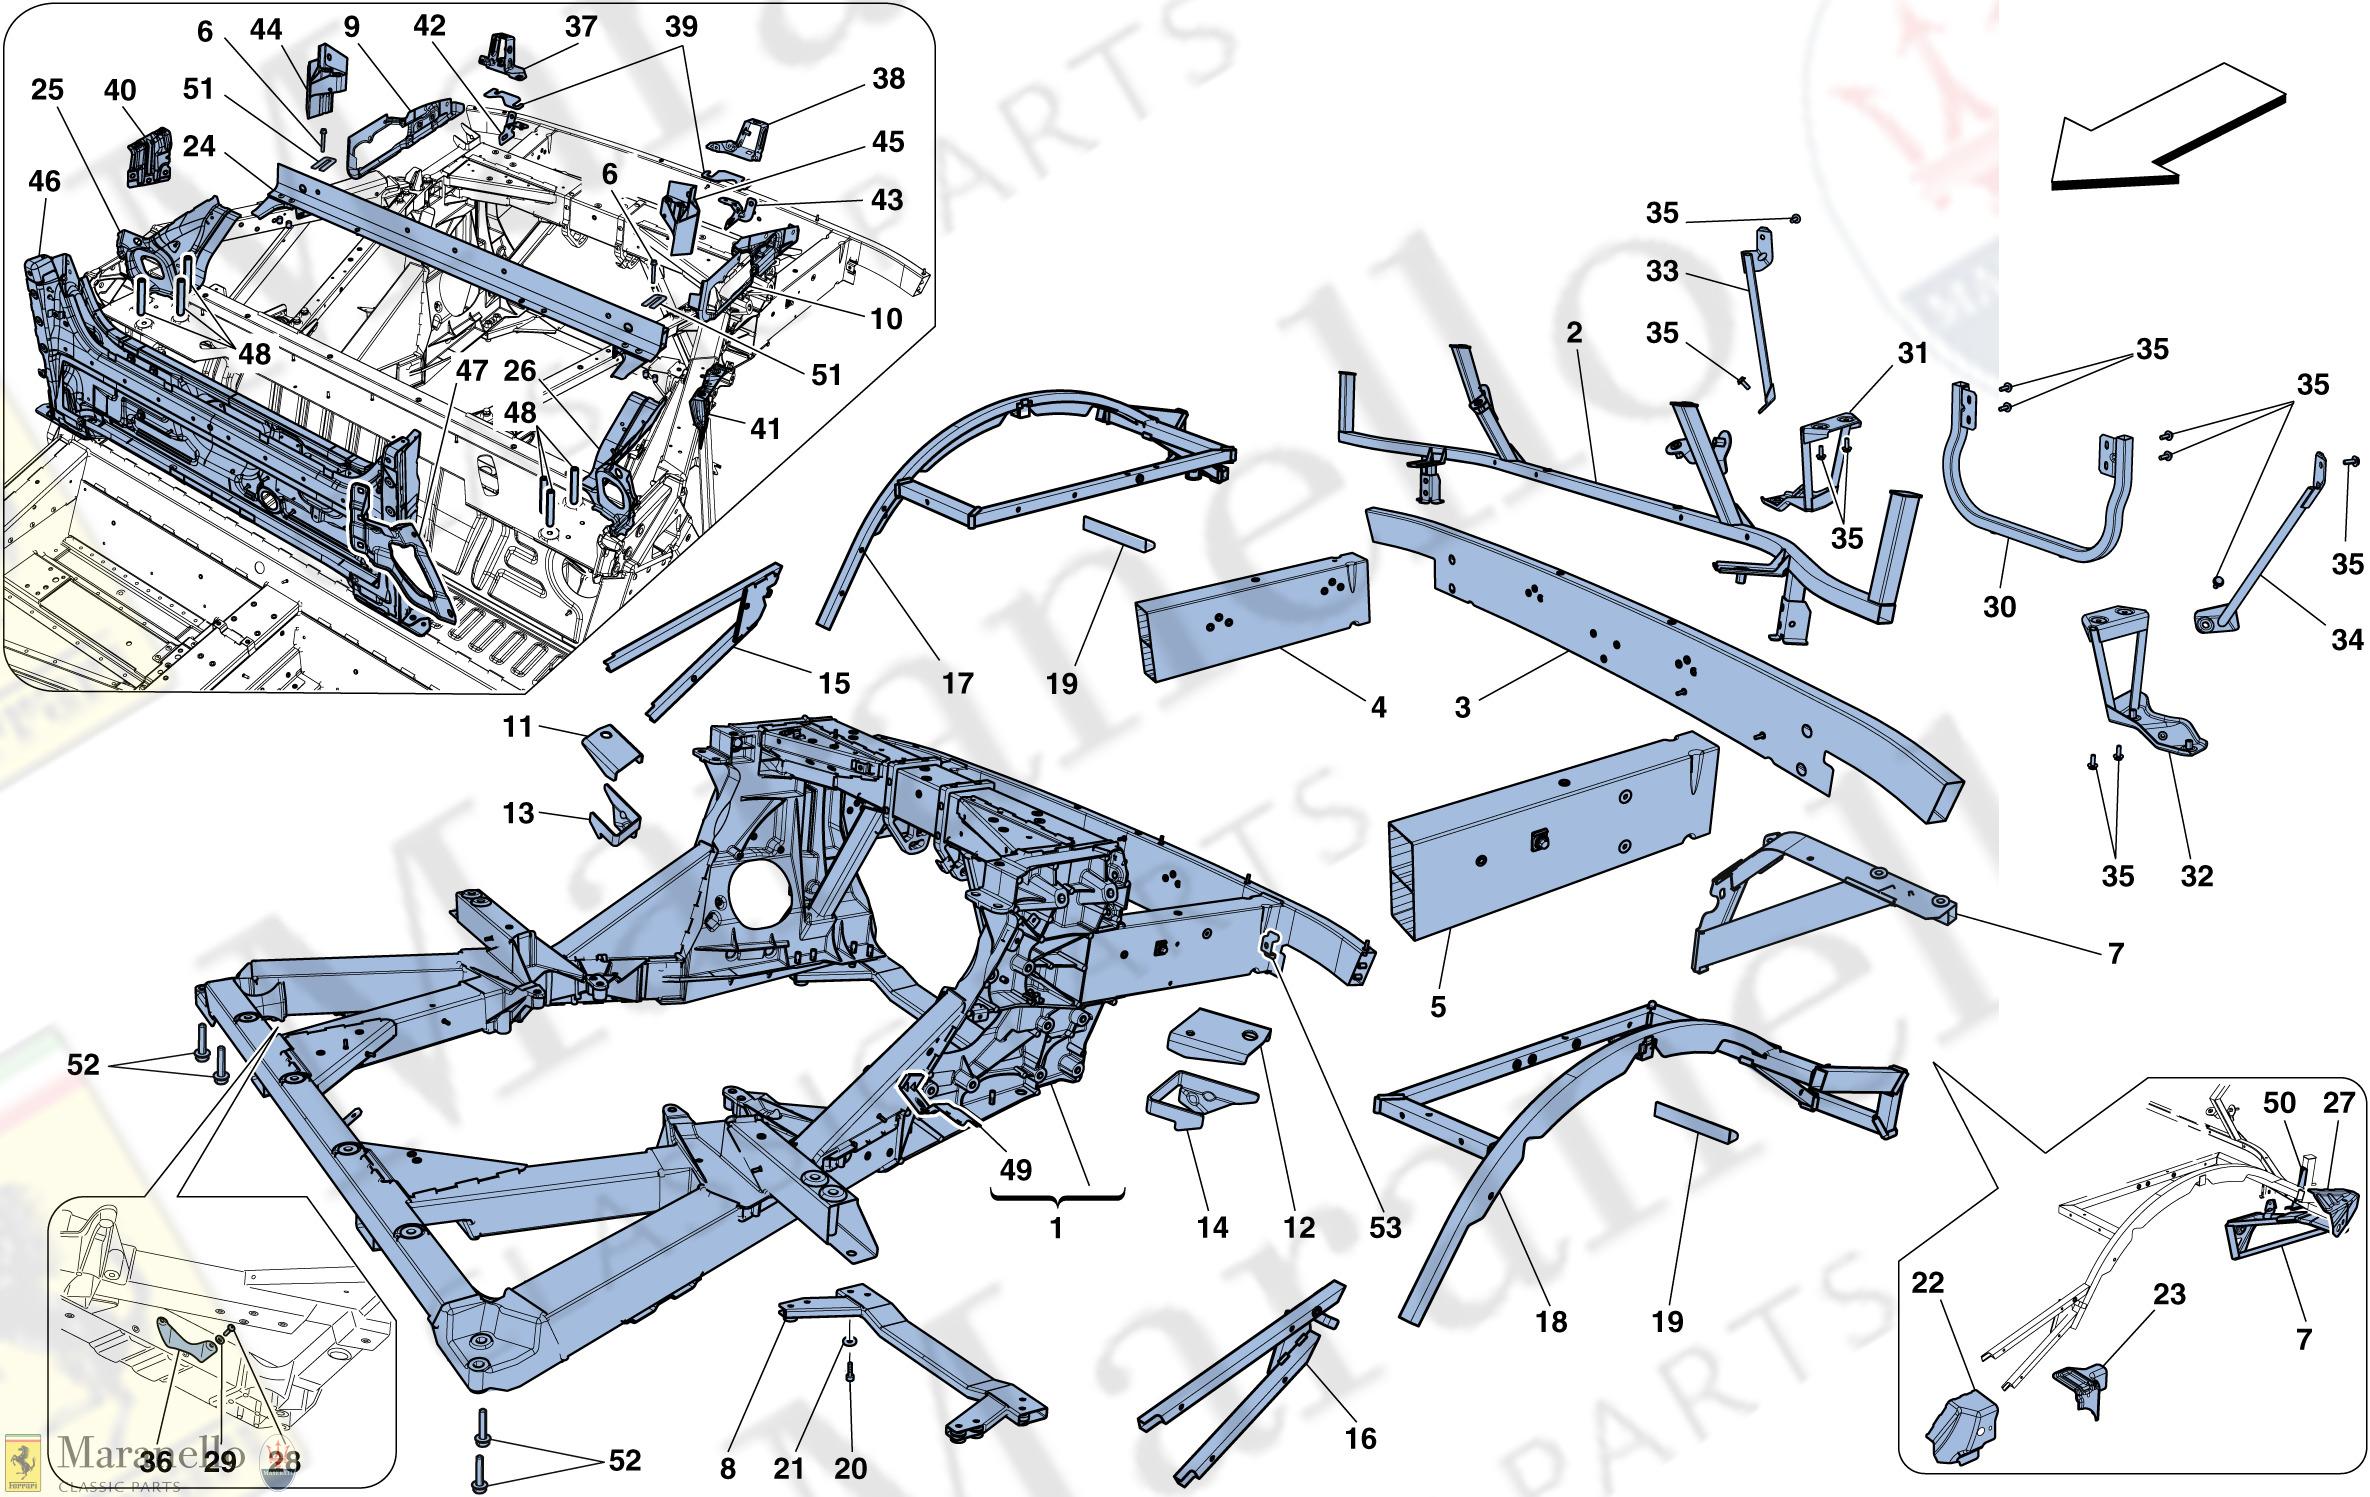 104 - Chis - Structure, Rear Elements And Panels parts ... Ferrari Spider Wiring Diagram on ferrari drifting, ferrari 612 scaglietti, ferrari f12 berlinetta, ferrari superamerica, ferrari p3, ferrari f50, ferrari truck, ferrari fxx, ferrari motor, ferrari 911 turbo, ferrari wallpaper, ferrari testarossa, ferrari motorcycle, ferrari california, mclaren spider, ferrari f430, ferrari convertible, ferrari spyder,